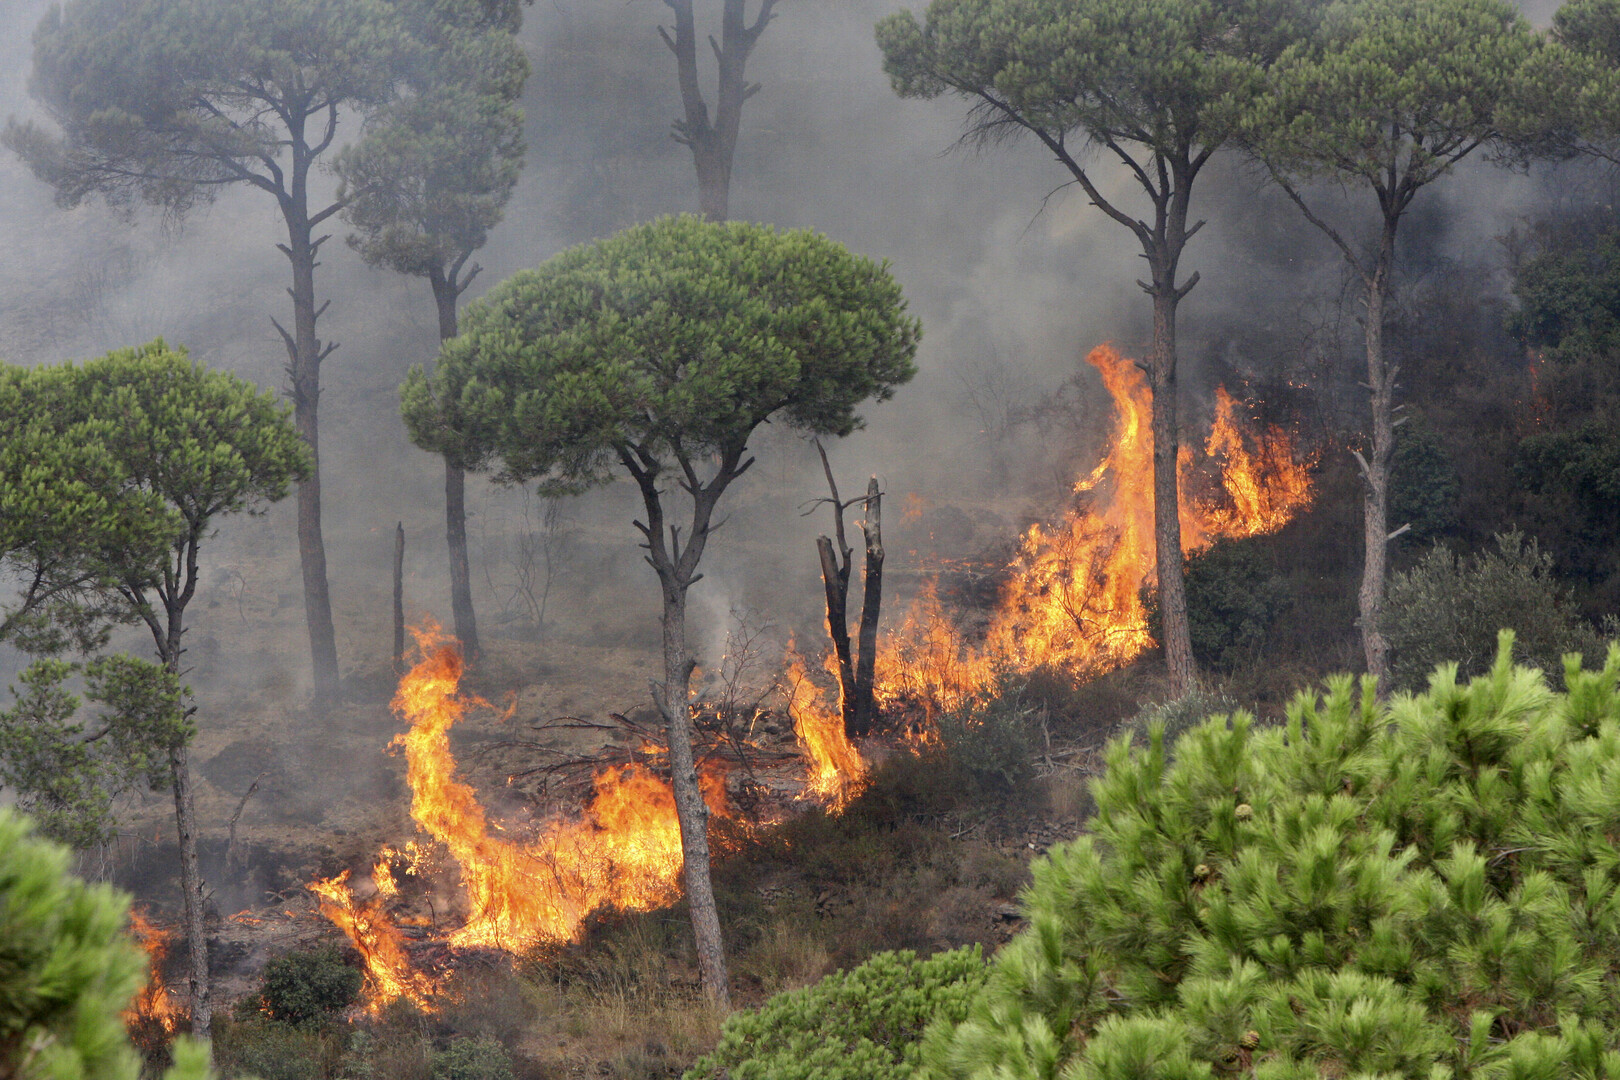 الحرائق تجتاح لبنان (فيديو)